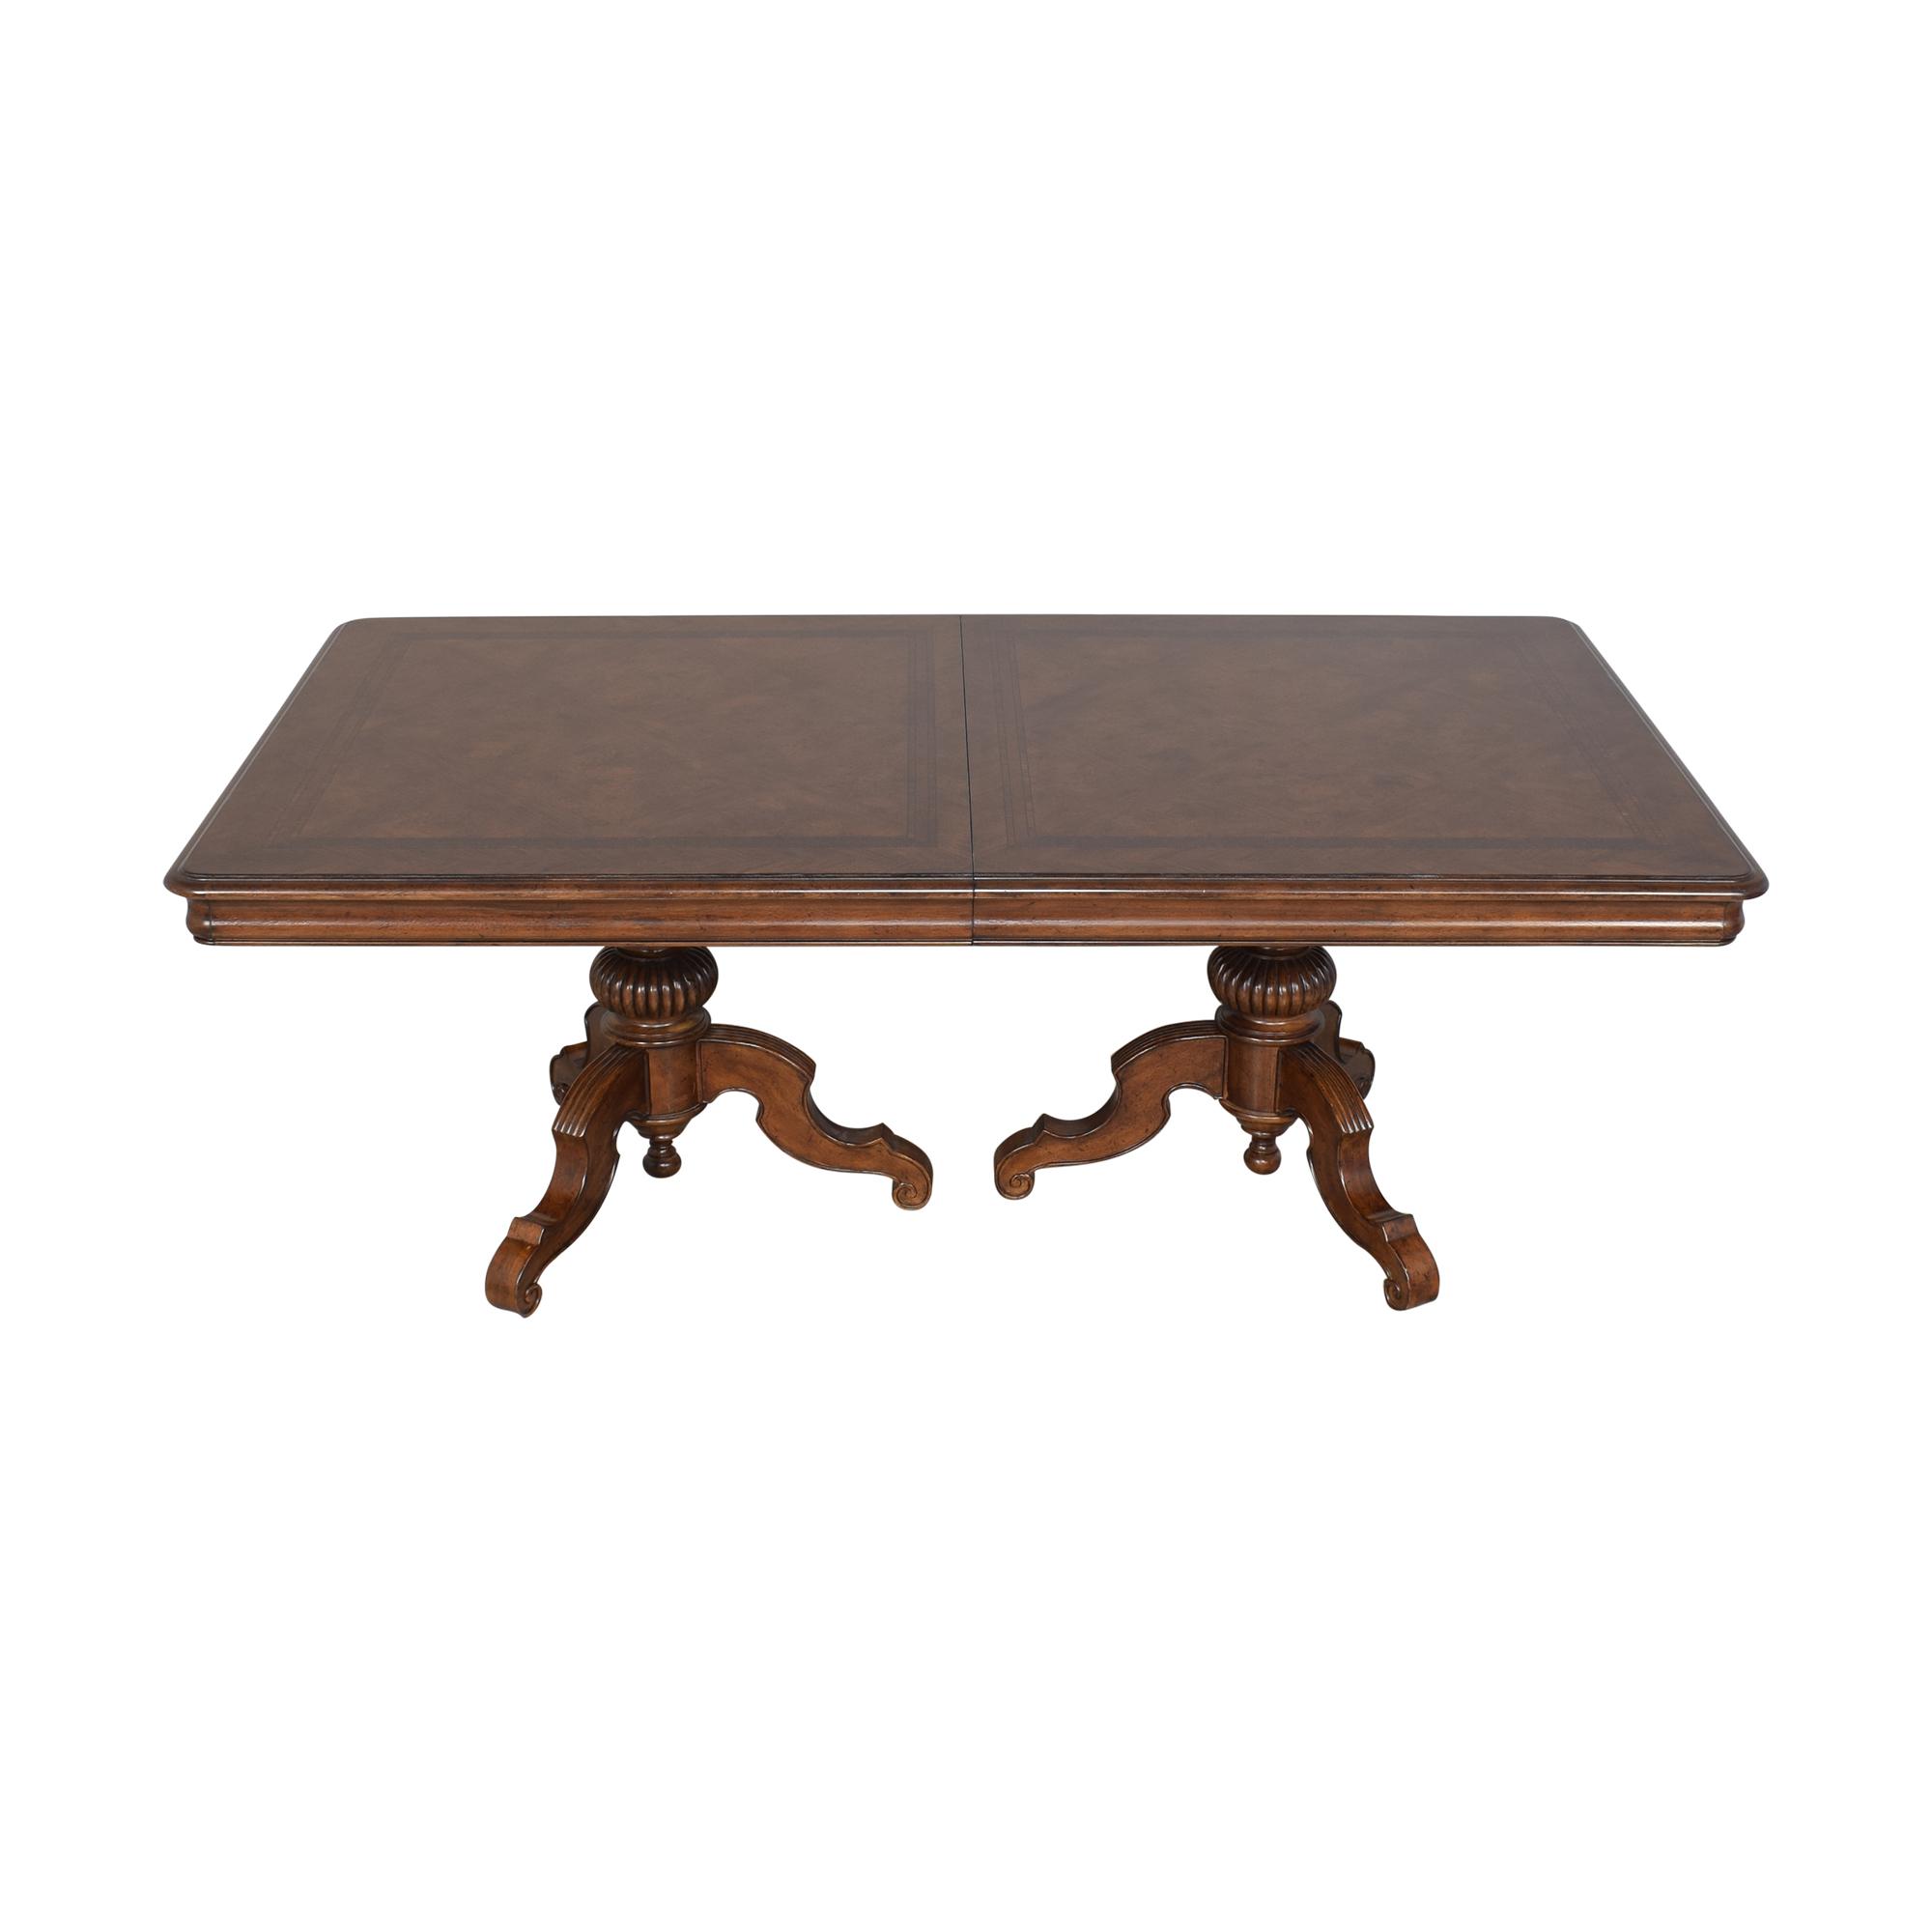 shop Thomasville Thomasville Ernest Hemingway Castillian Double Pedestal Dining Table online